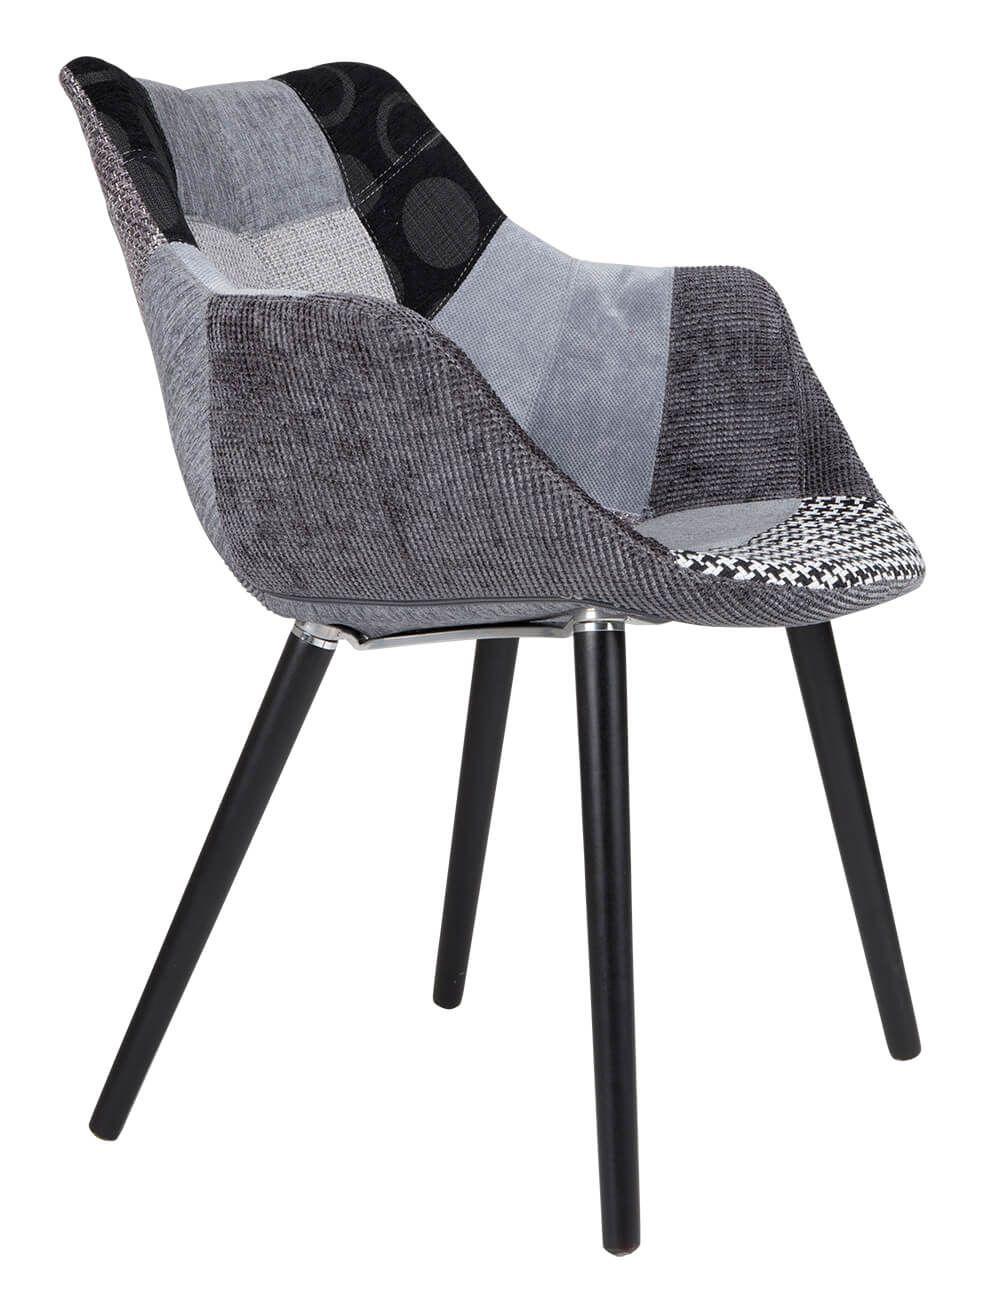 Kėdės Jaukumas Lt Patchwork Chair Furniture Design Table Chair